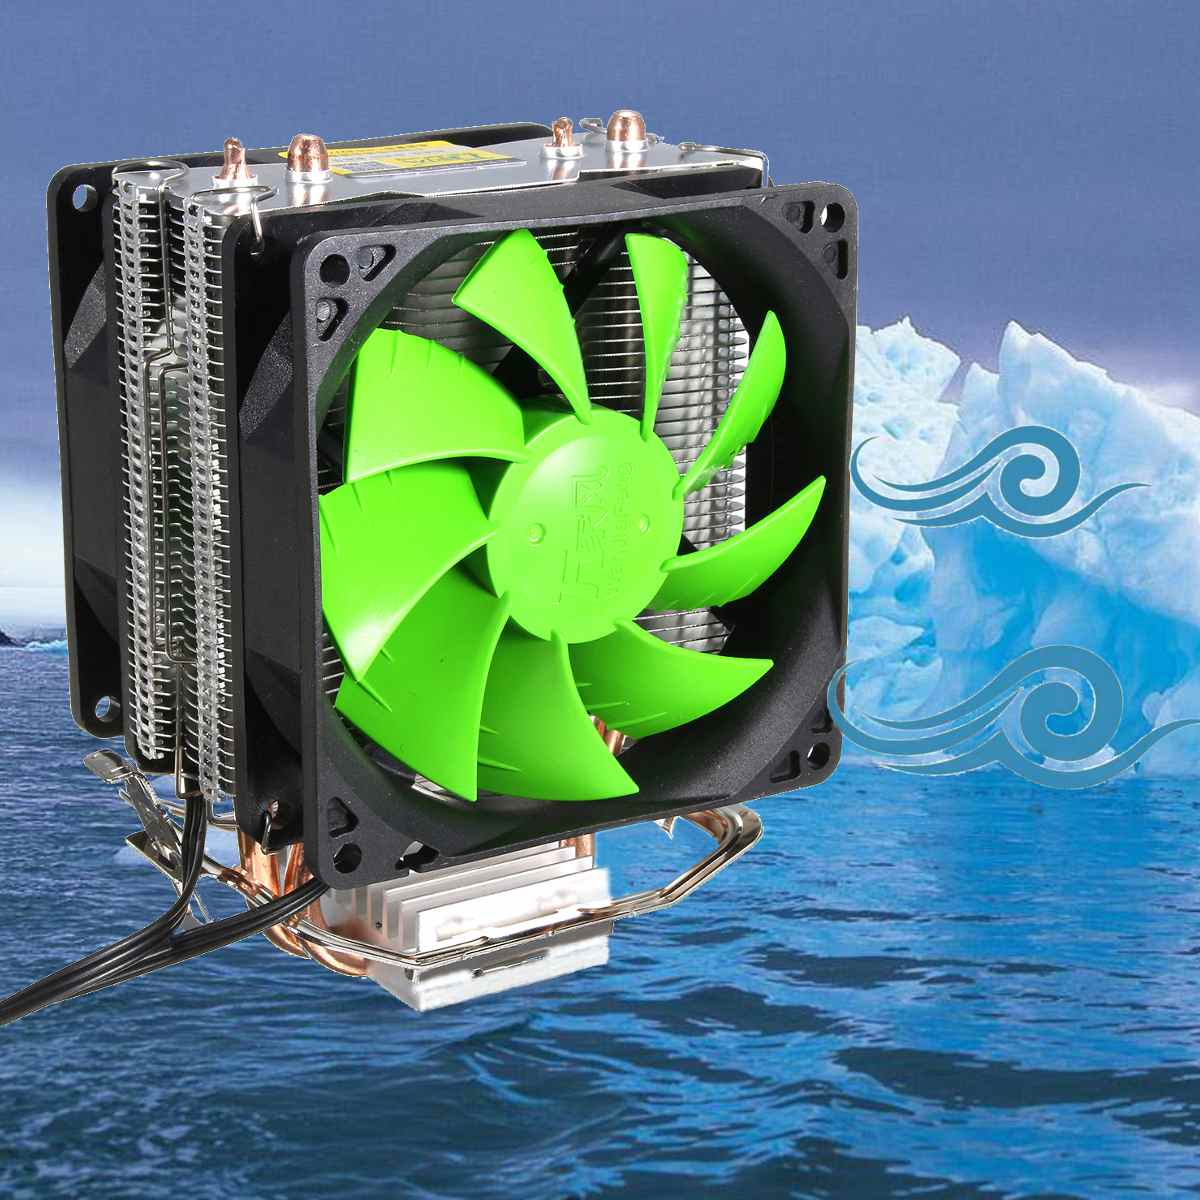 3 Pin Dual Fan CPU Cooler Dissipador de Calor com Ventilador de Refrigeração da CPU Para Intel LGA775/1150/1155 AMD AM2 /AM2 +/AM3 AM4 Ryzen Pasta Termica